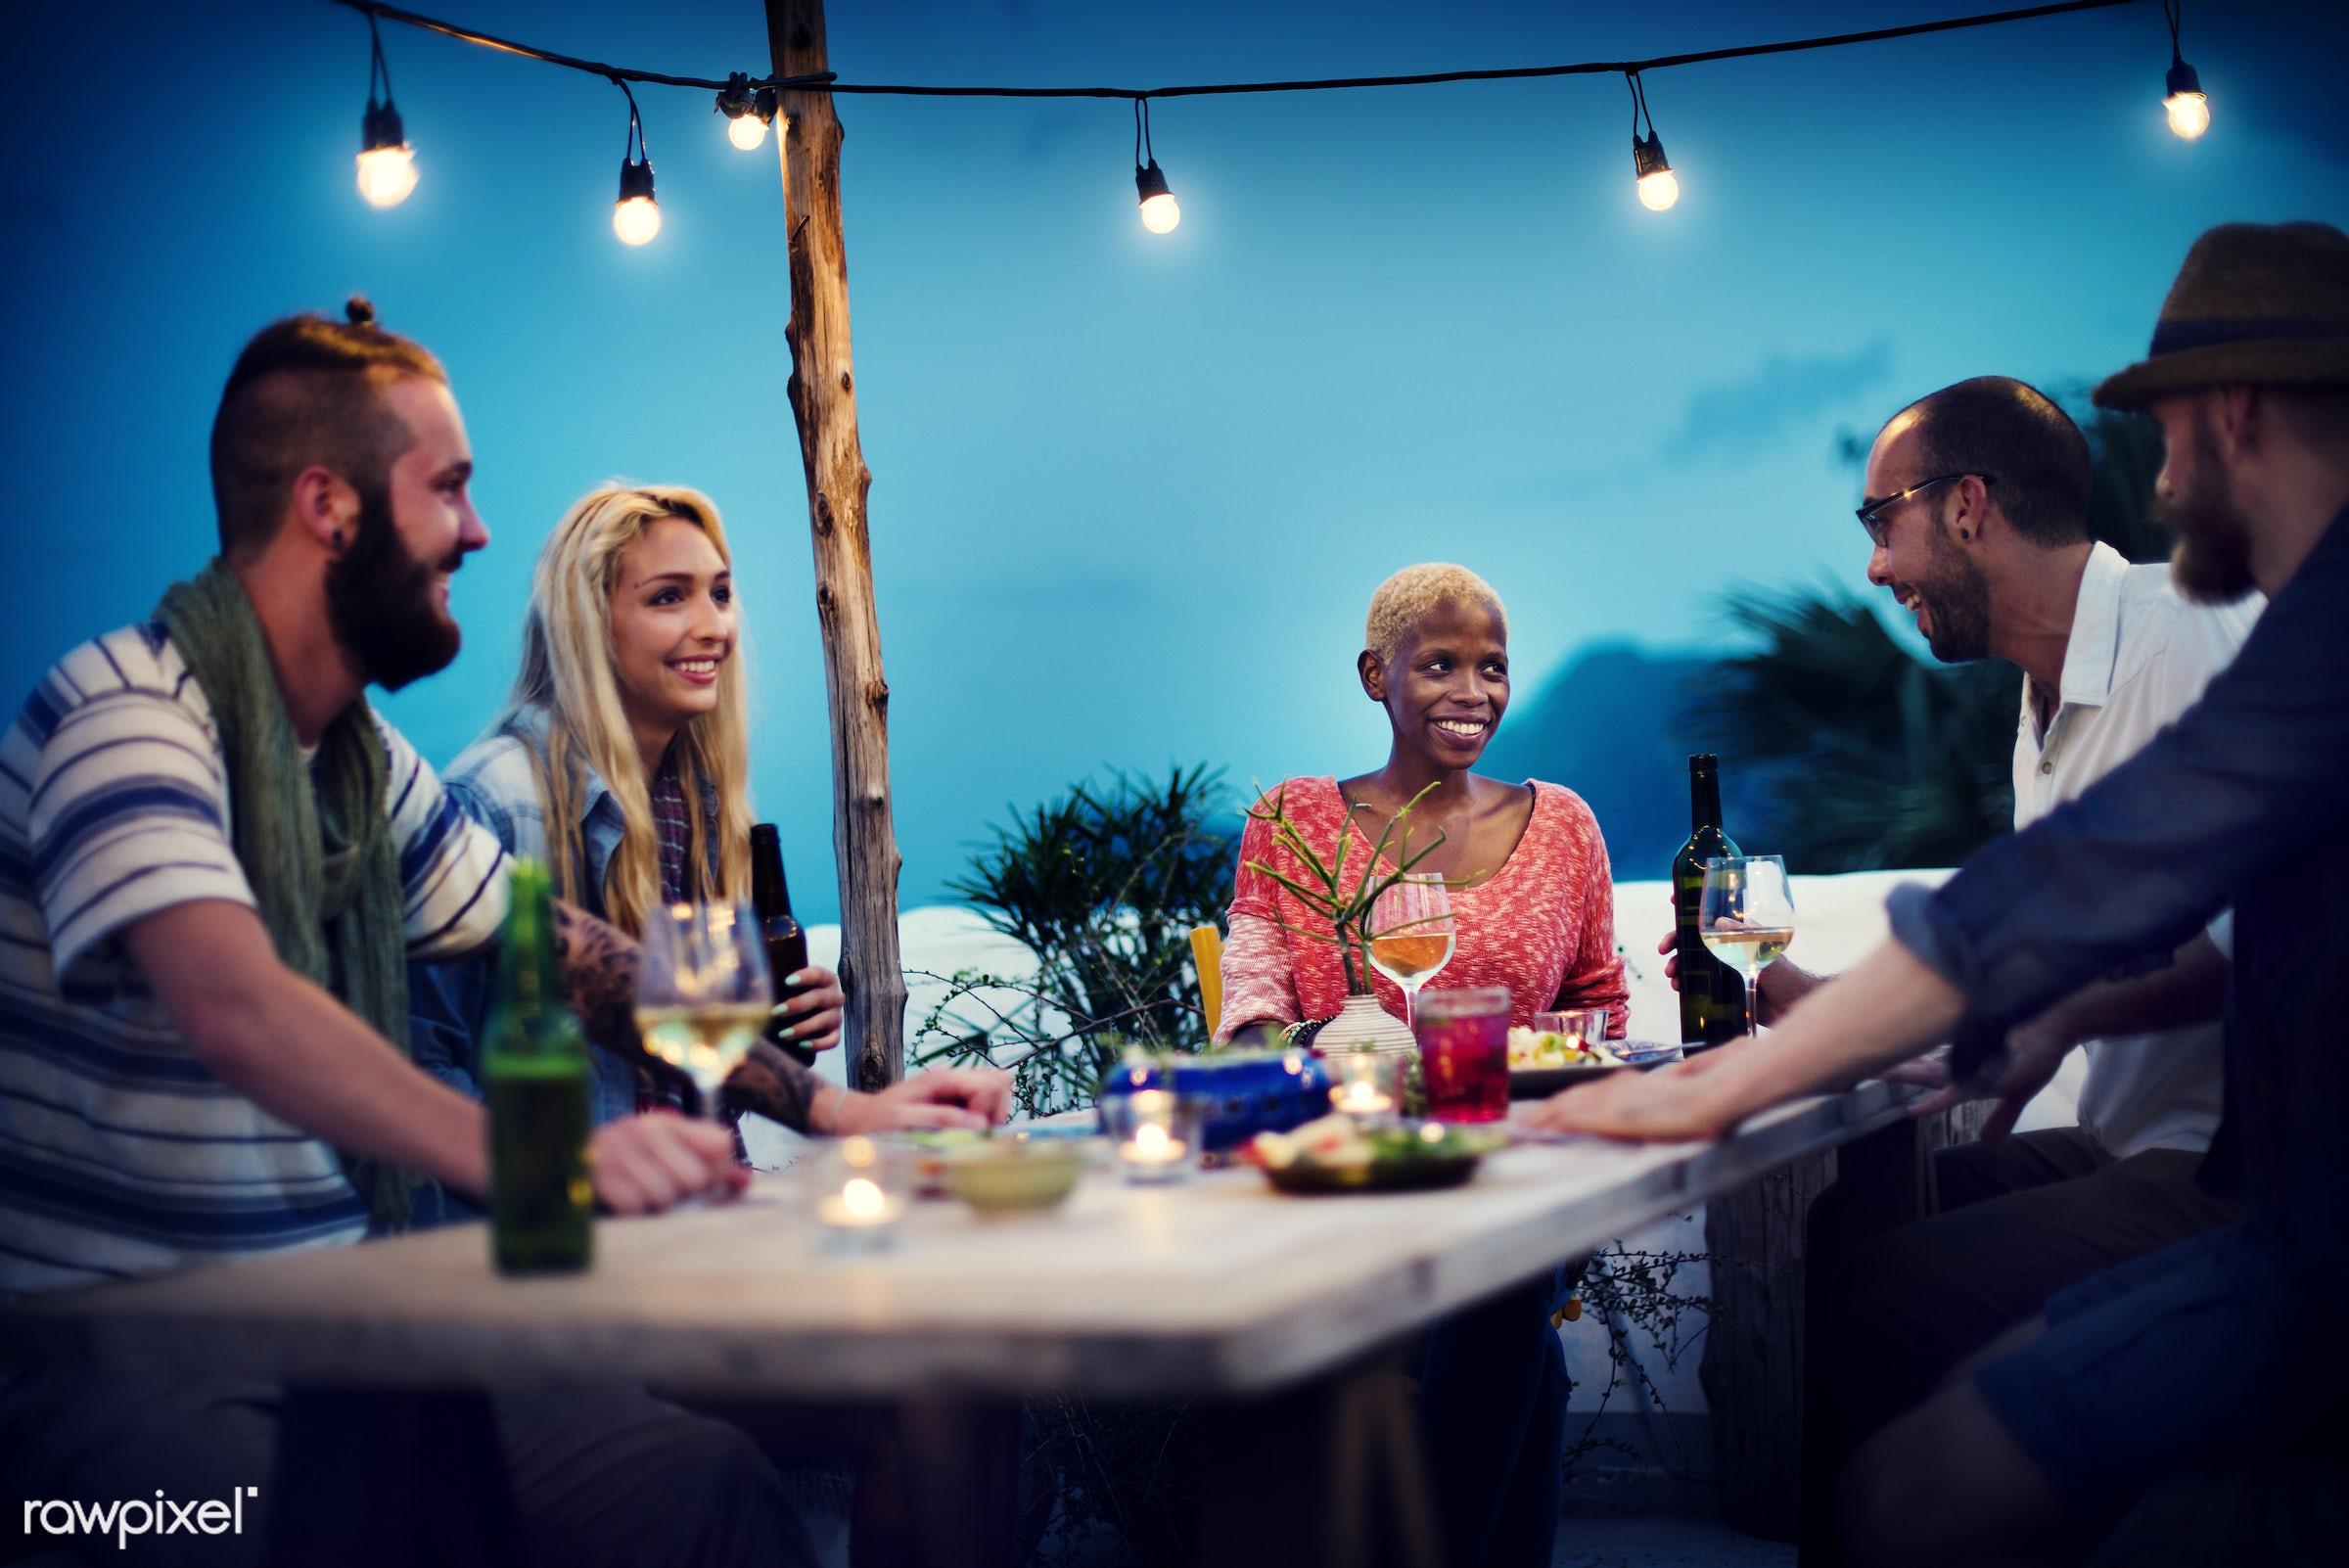 african descent, beach, beer, beverage, casual, celebration, community, conversation, dinner, drink, drinking, eating, food...